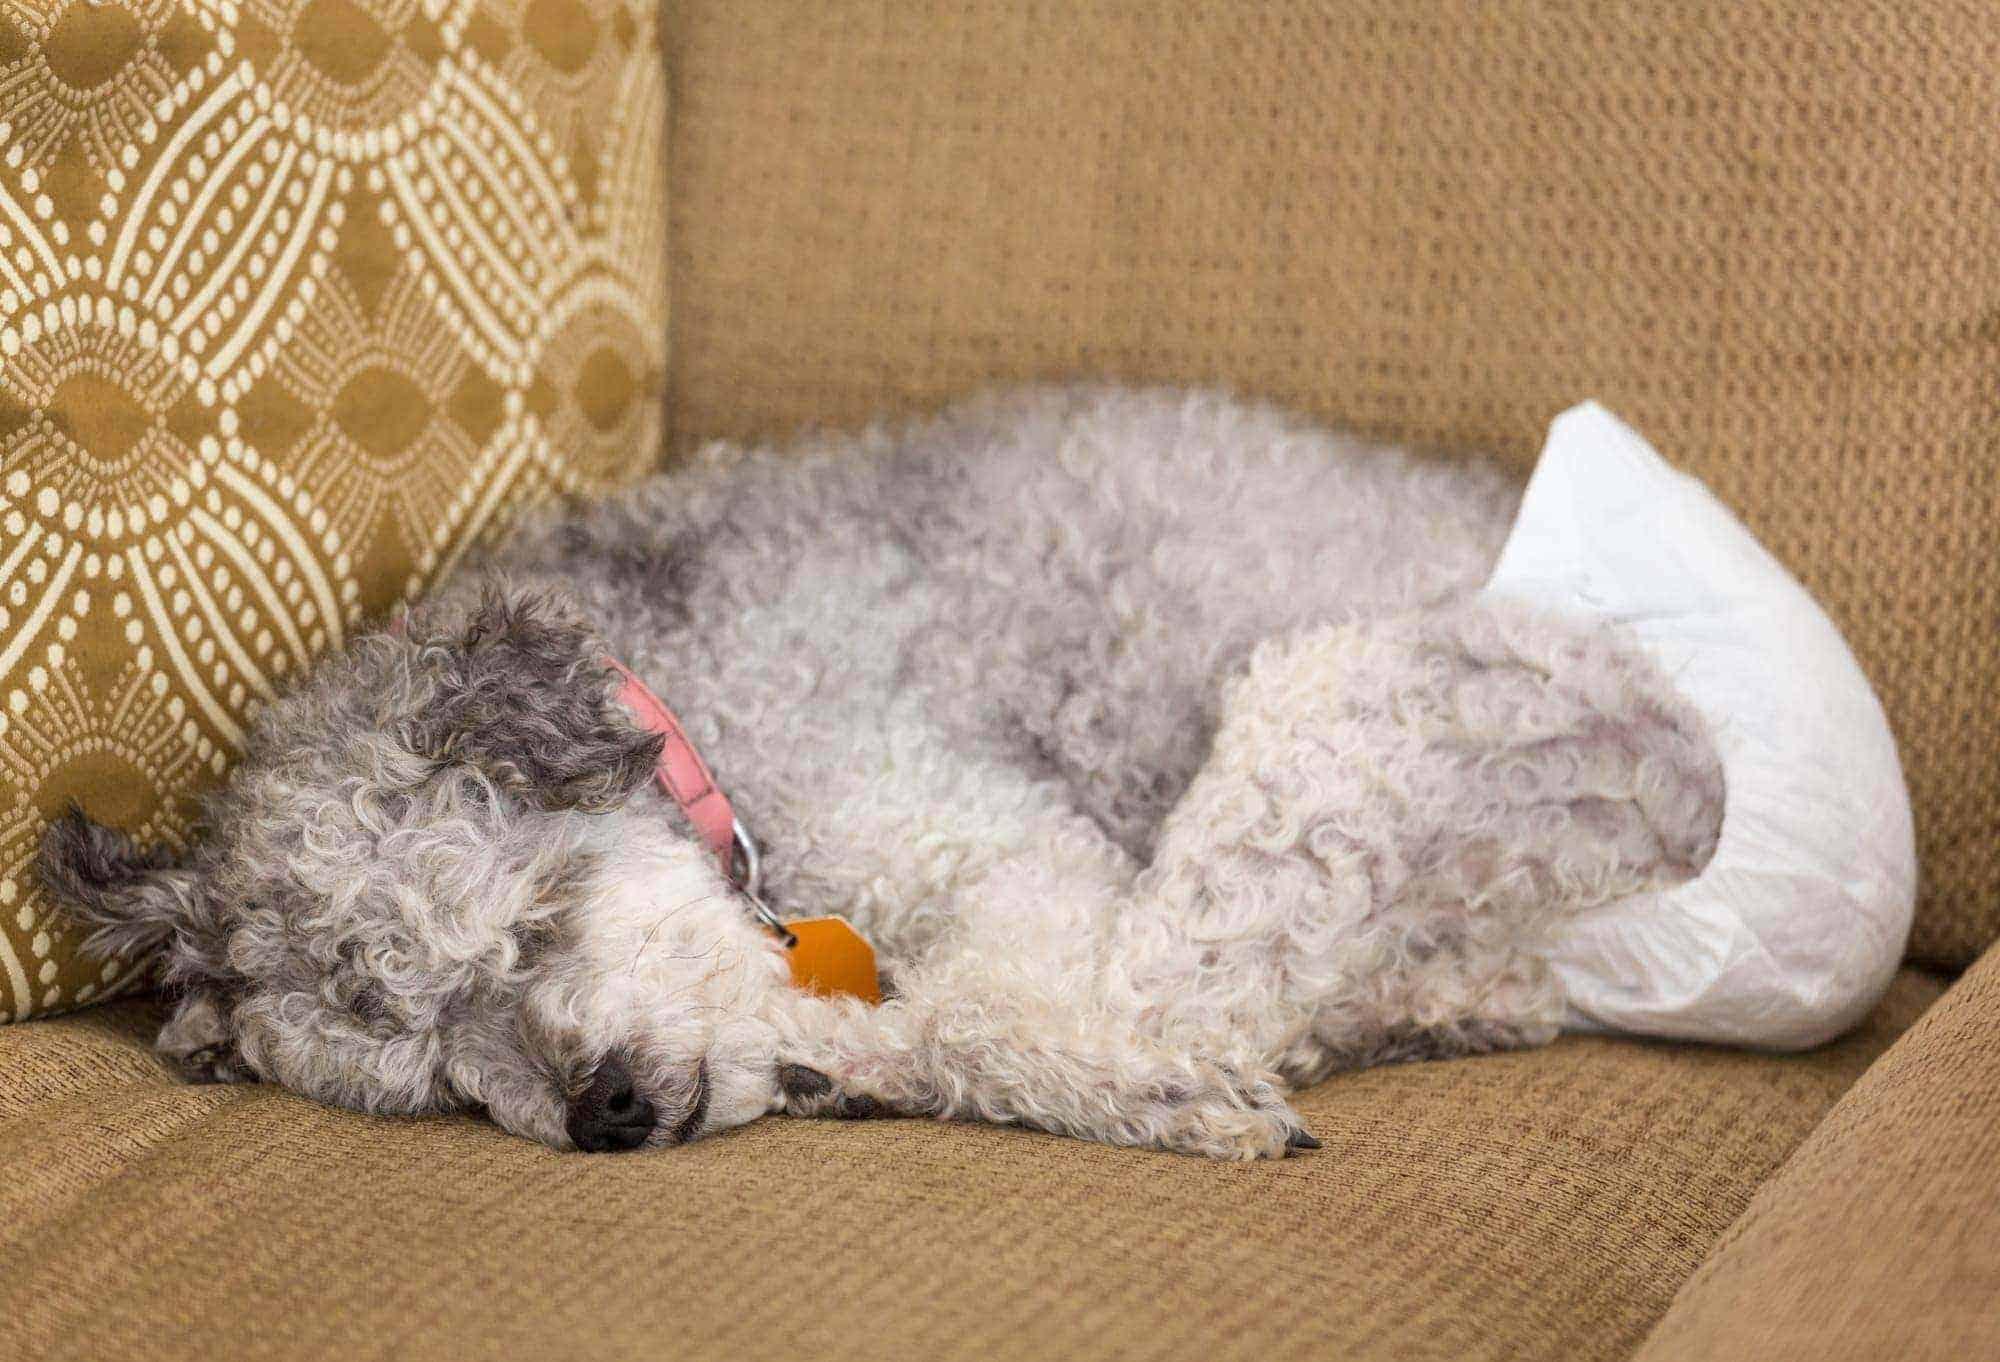 dog in heat wearing a diaper